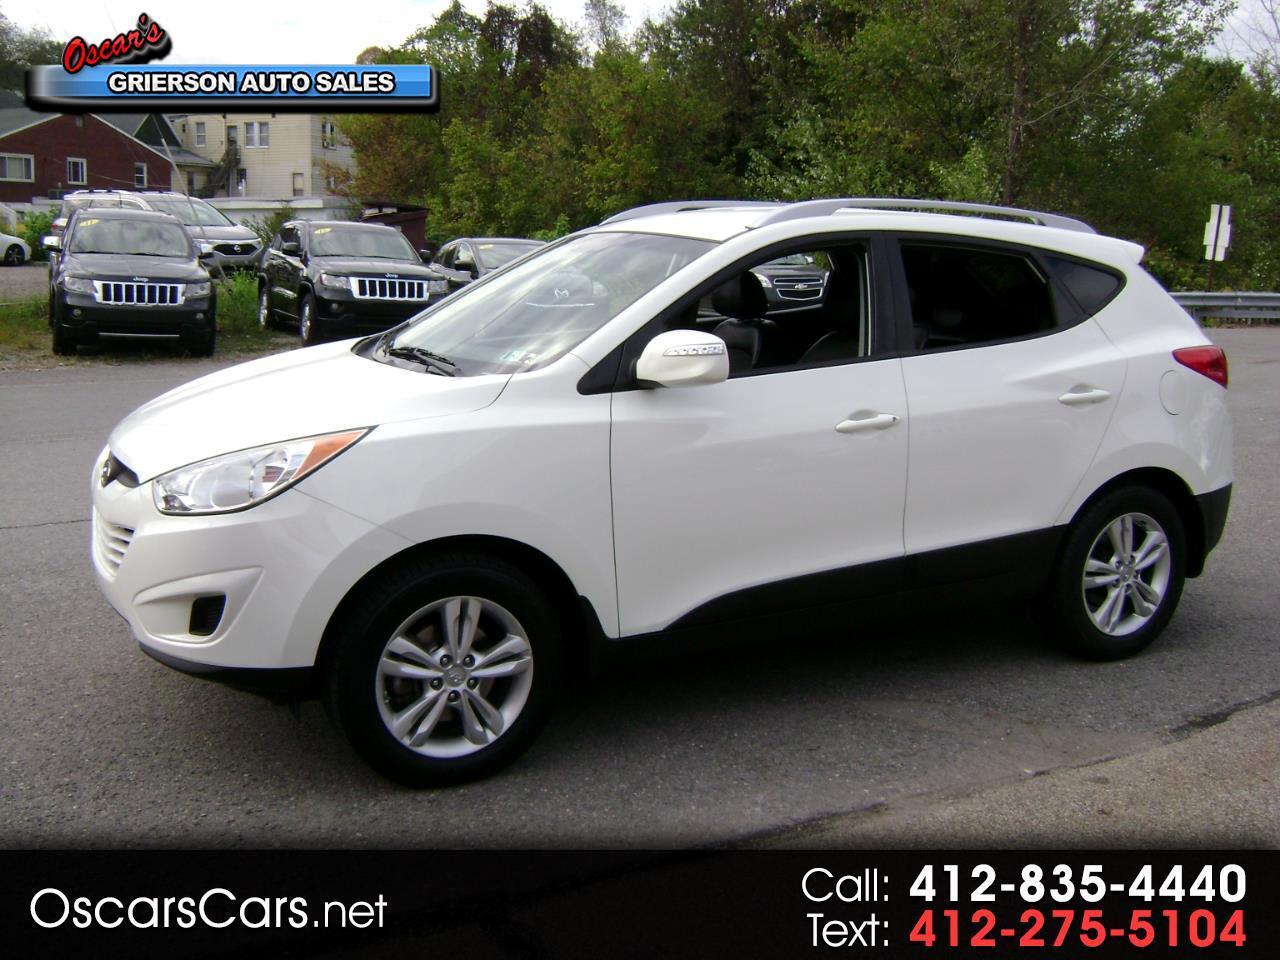 2012 Hyundai Tucson AWD 4dr Auto GLS PZEV